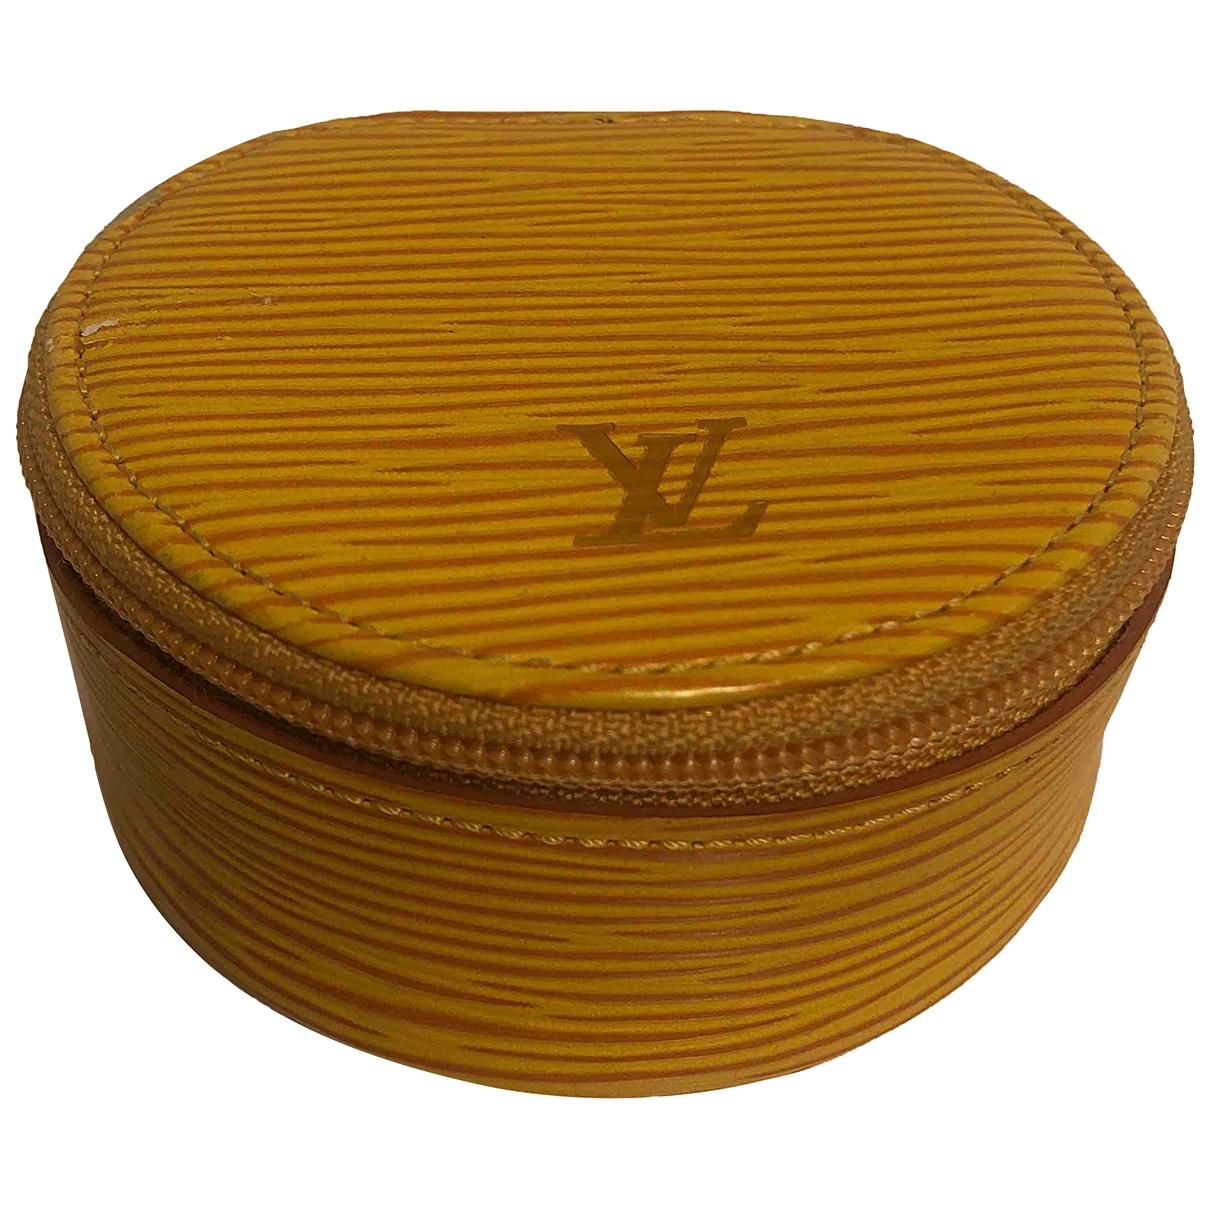 Objeto de decoracion de Cuero Louis Vuitton